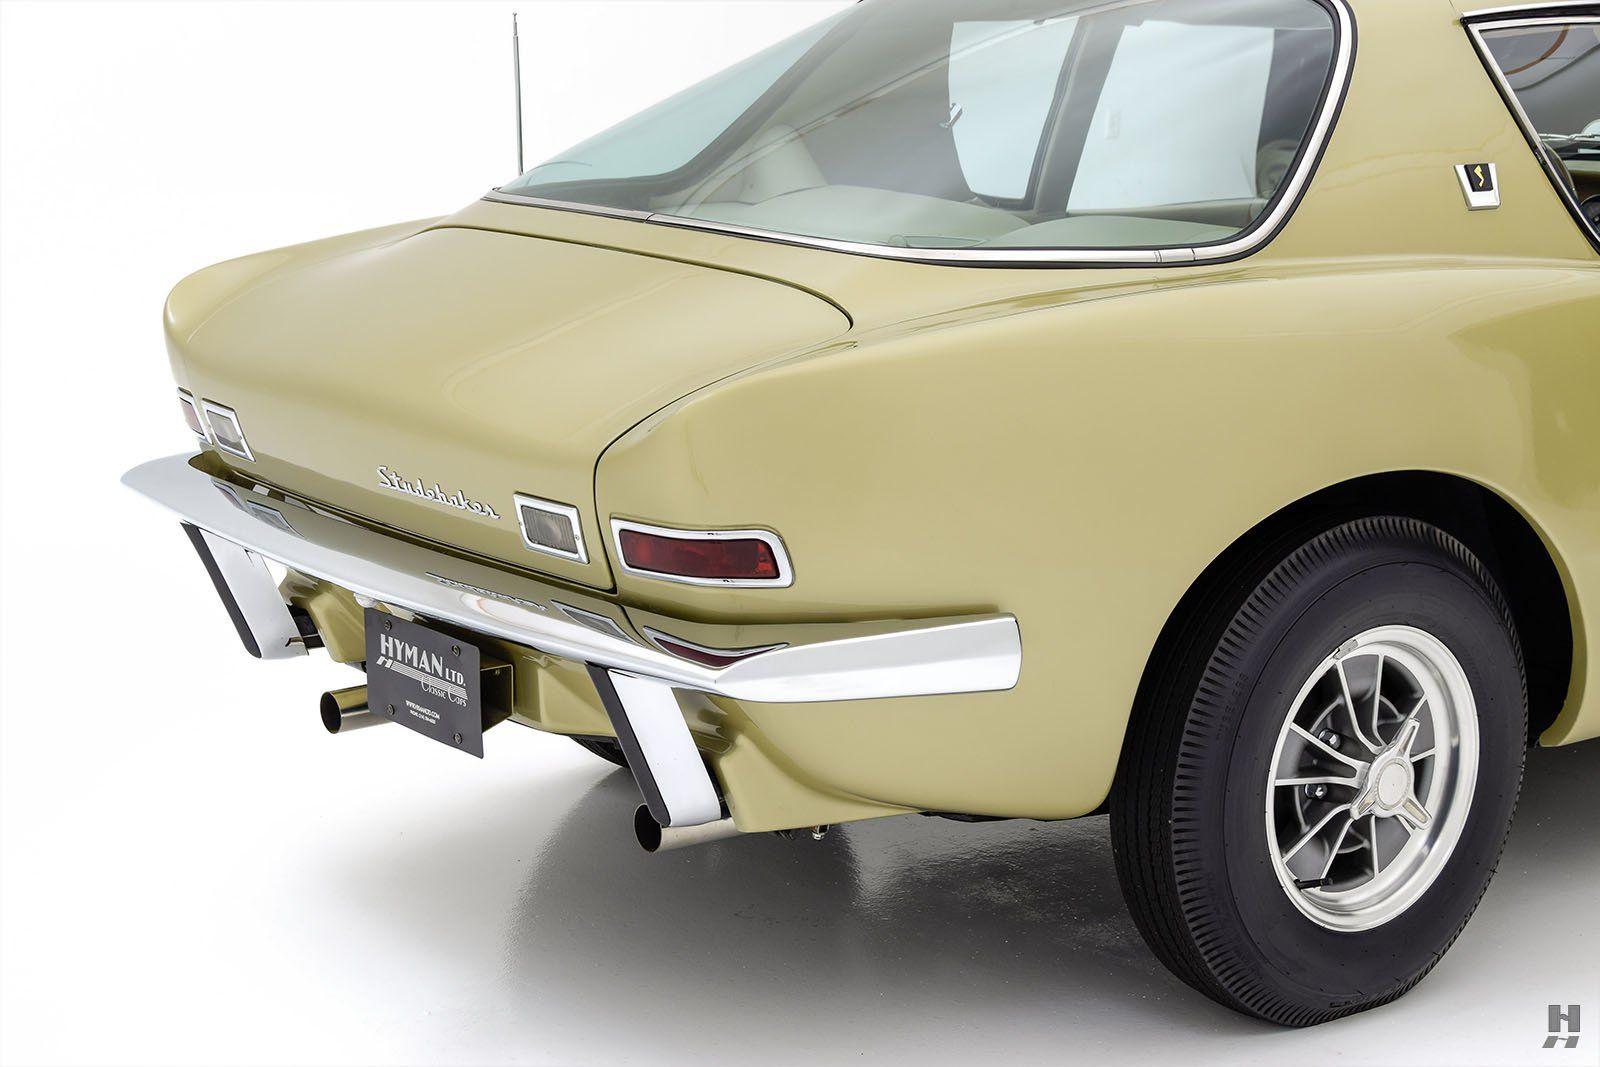 1963 Studebaker Avanti R2 Hyman Ltd Classic Cars Studebaker Car Features Gt Cars